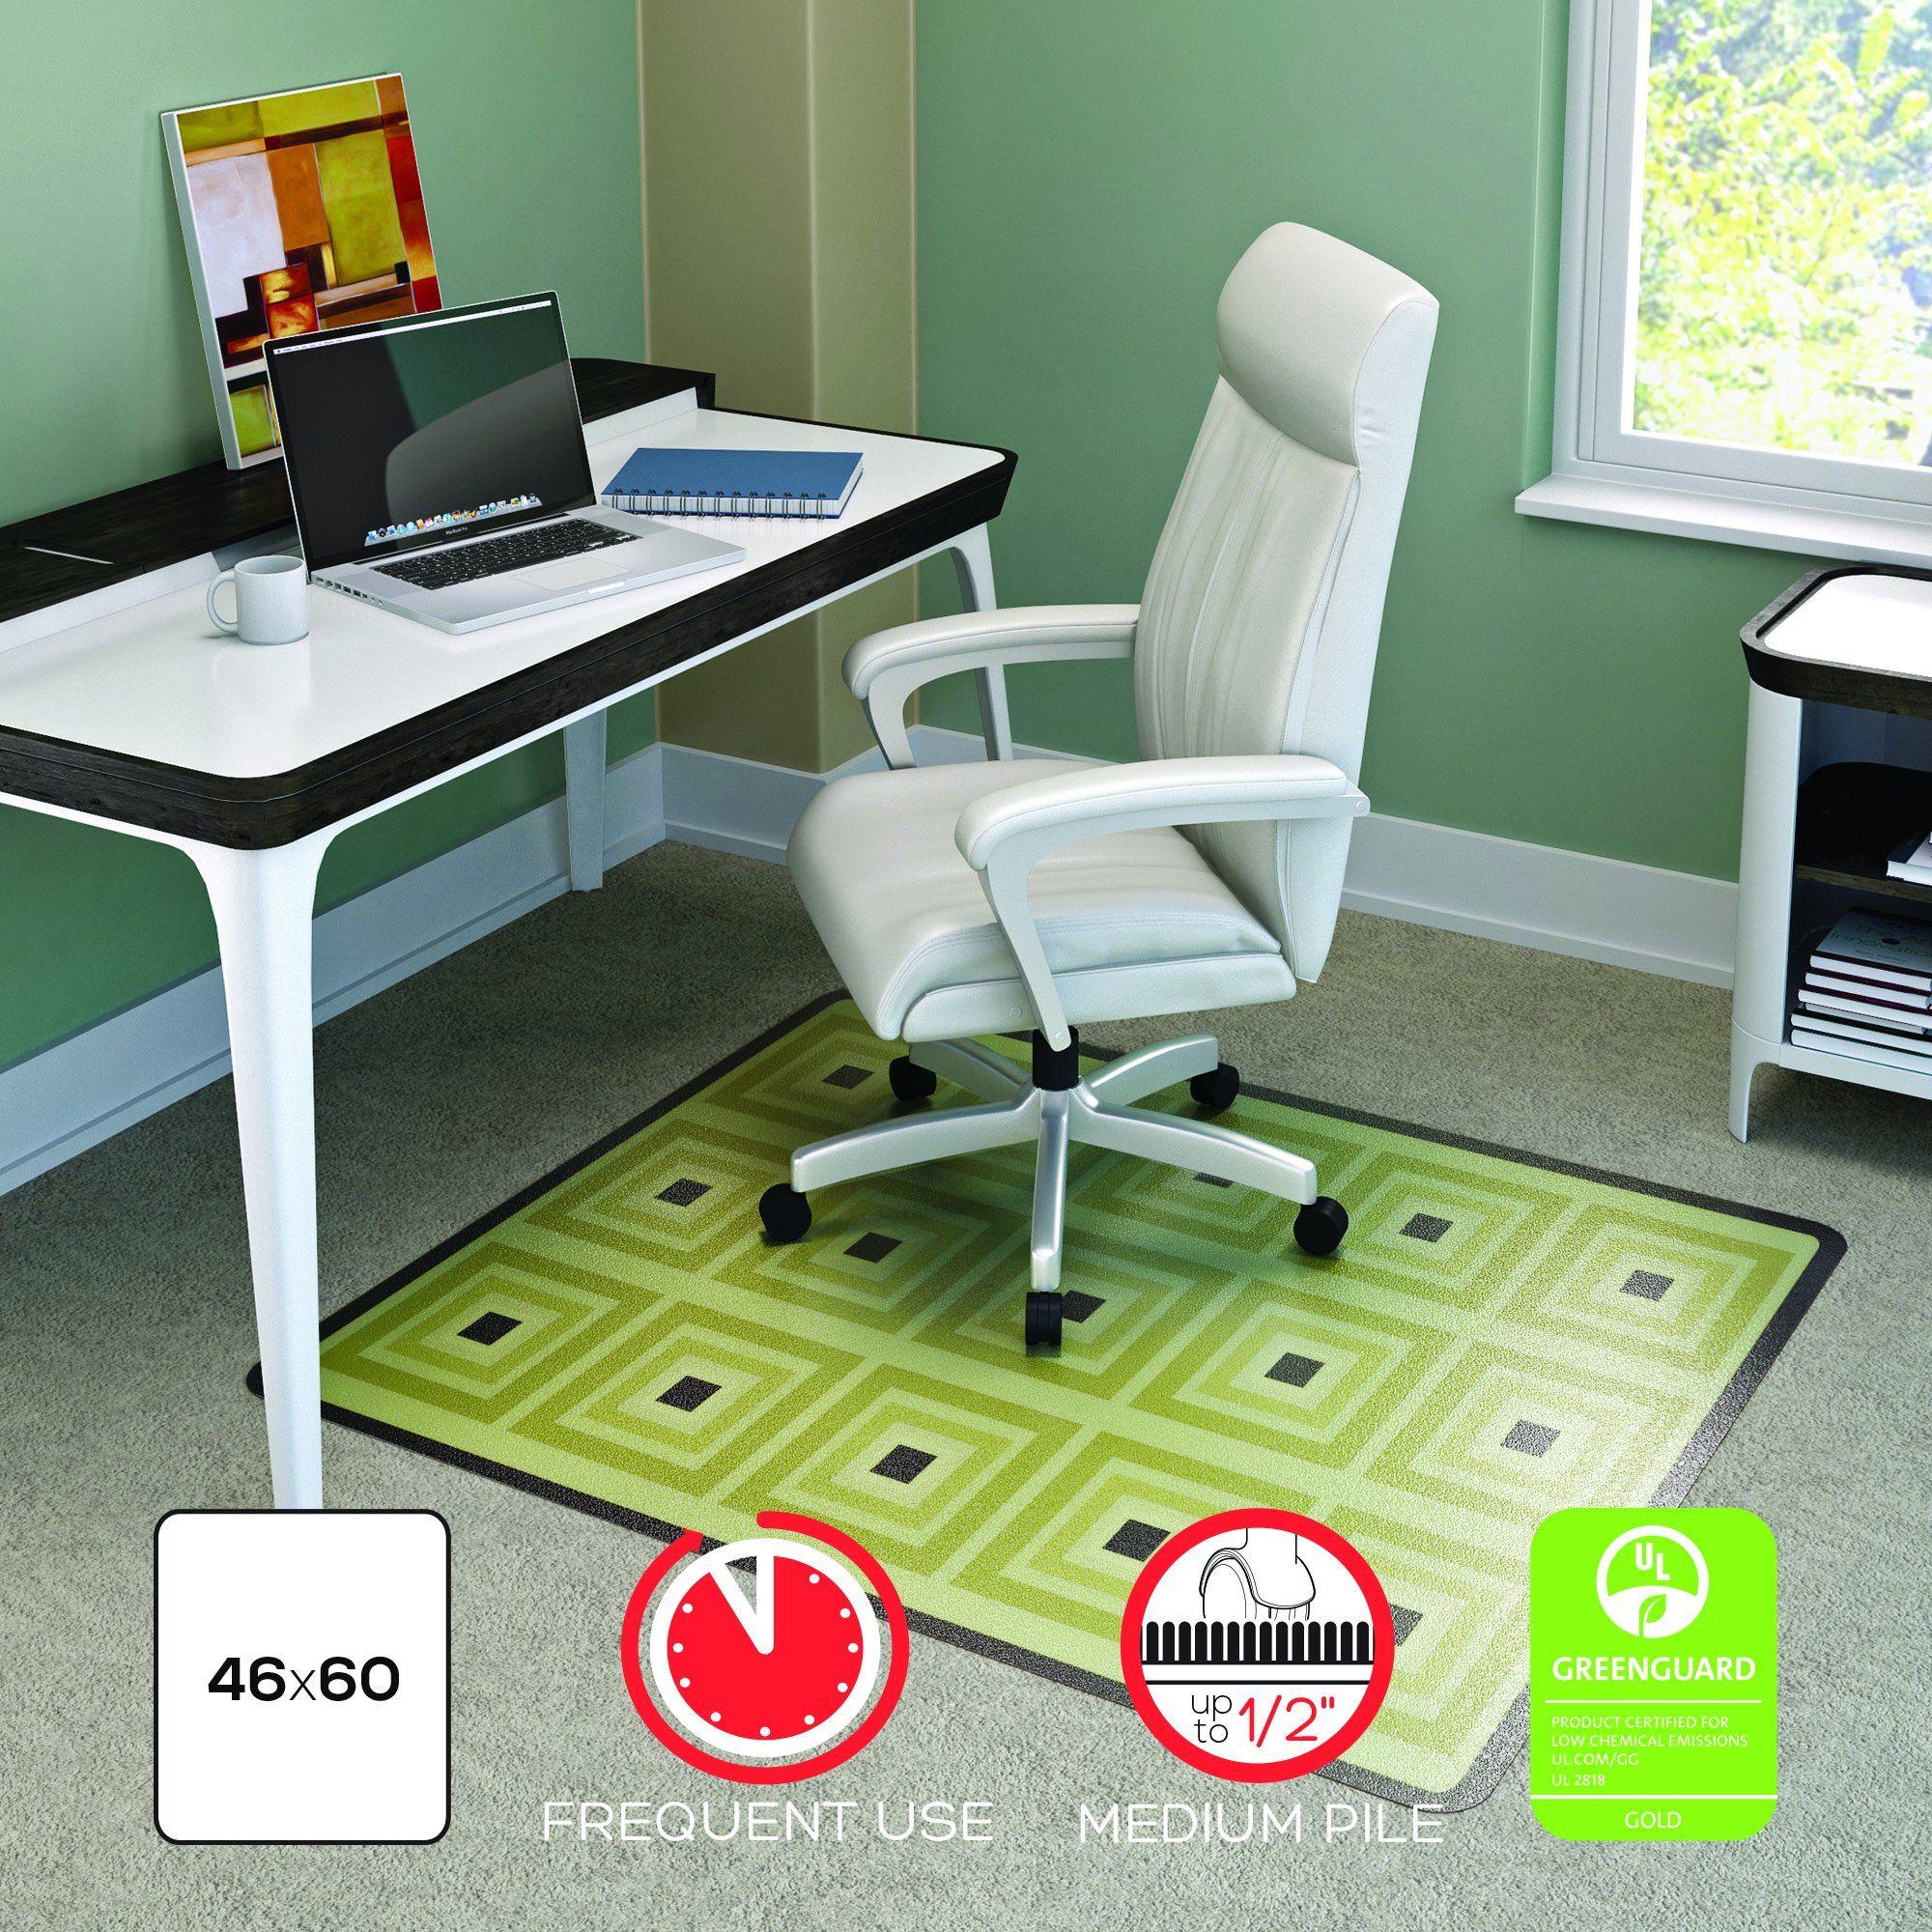 Superieur Deflecto RollaMat Decorative Chair Mat Medium Pile Carpet Use Rectangle  Straight Edge 46 X 60 Inches